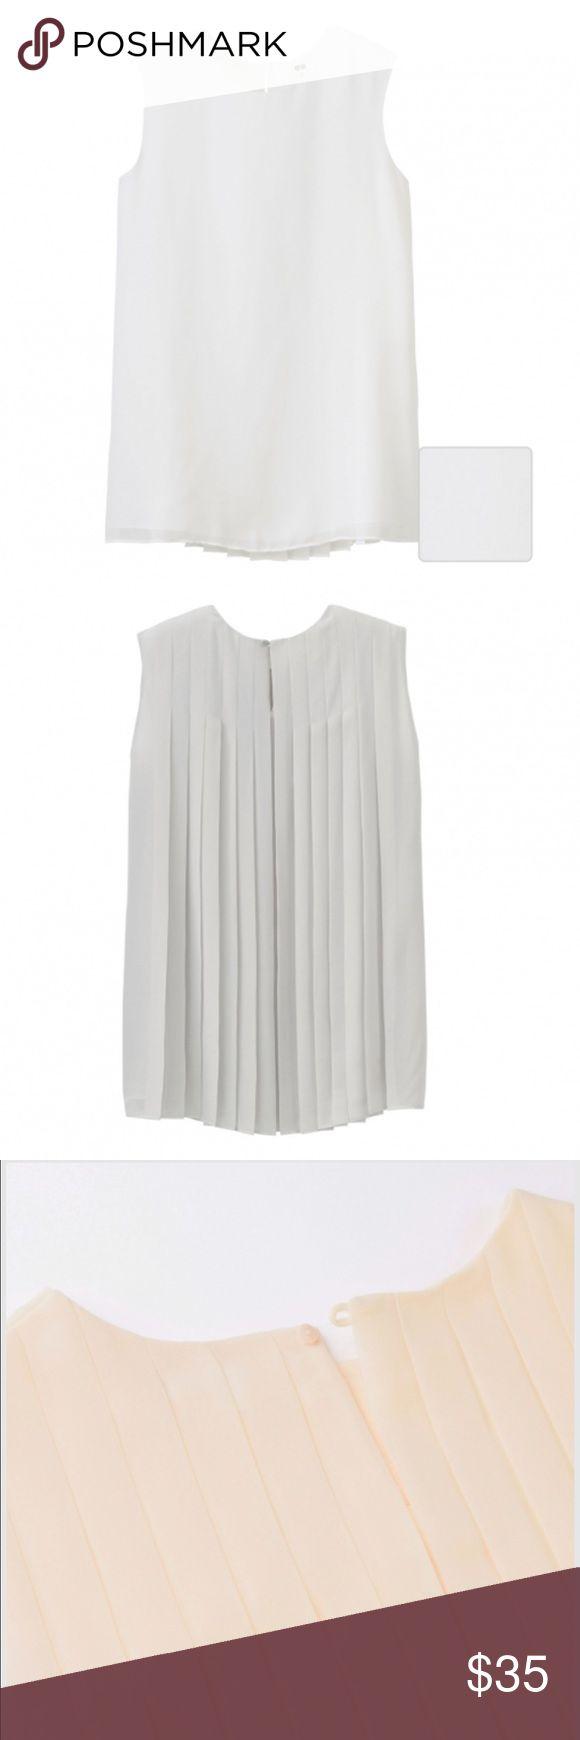 NWT Uniqlo White Blouse - Size Xs NWT Uniqlo White Blouse - Size Xs - Back Pleated - New Uniqlo Tops Blouses